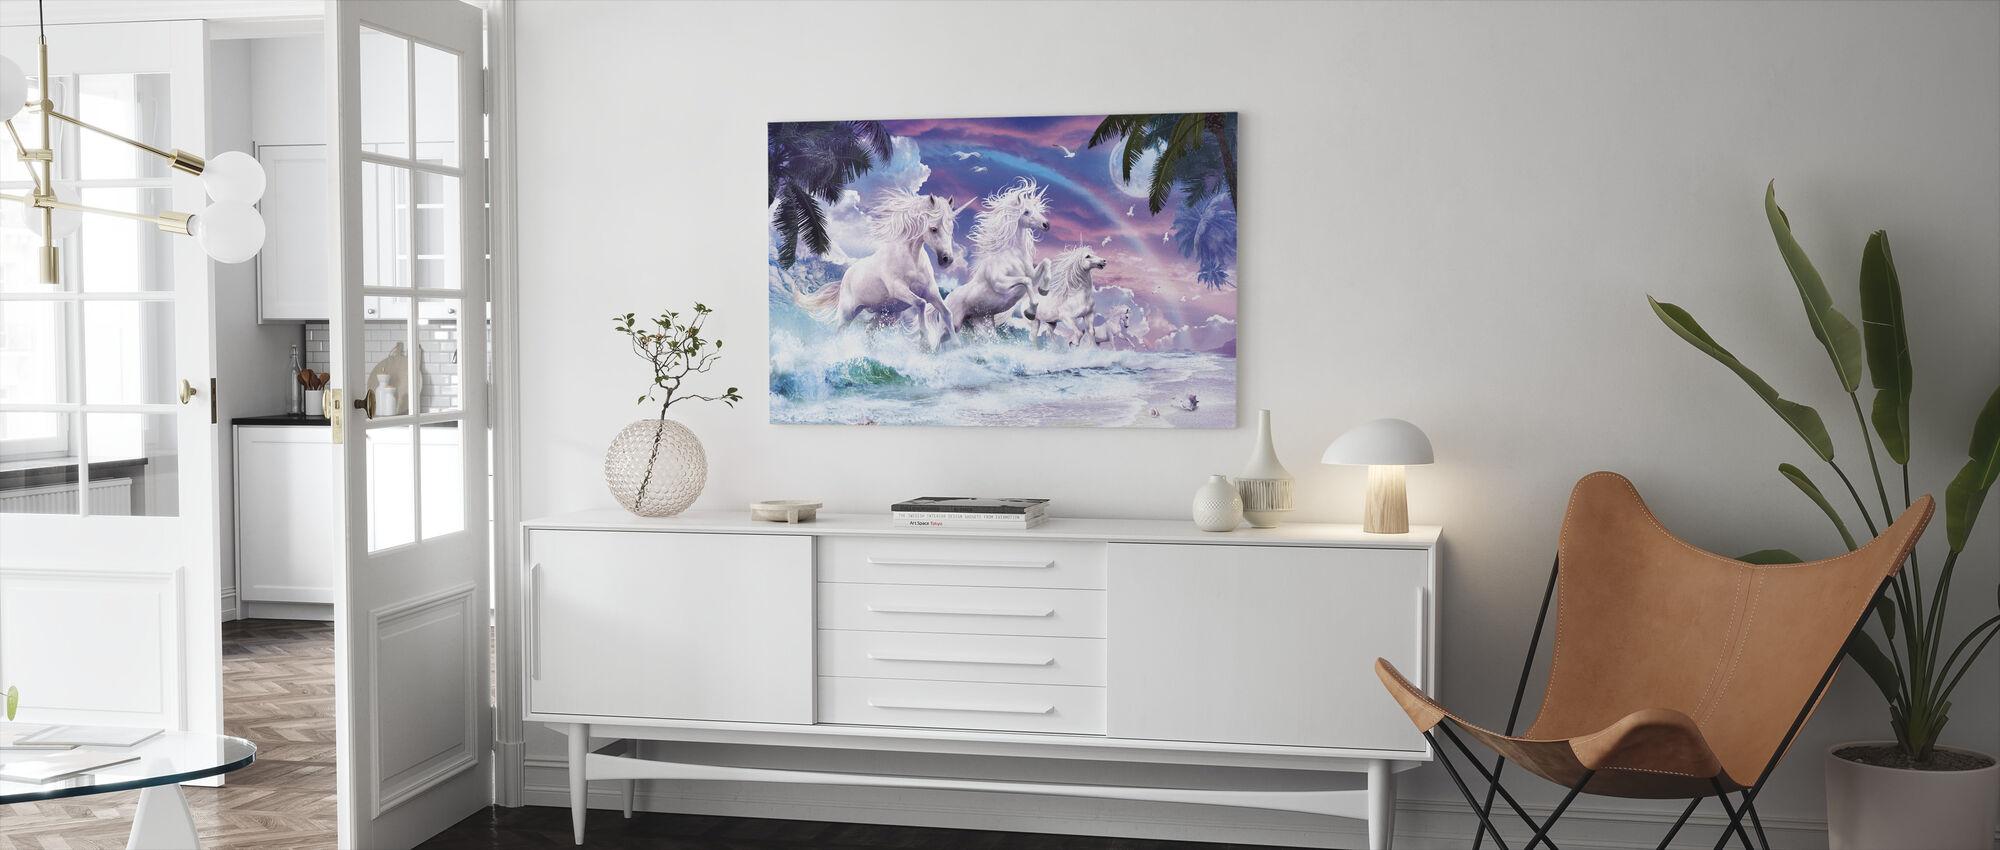 Enhörning vågor - Canvastavla - Vardagsrum